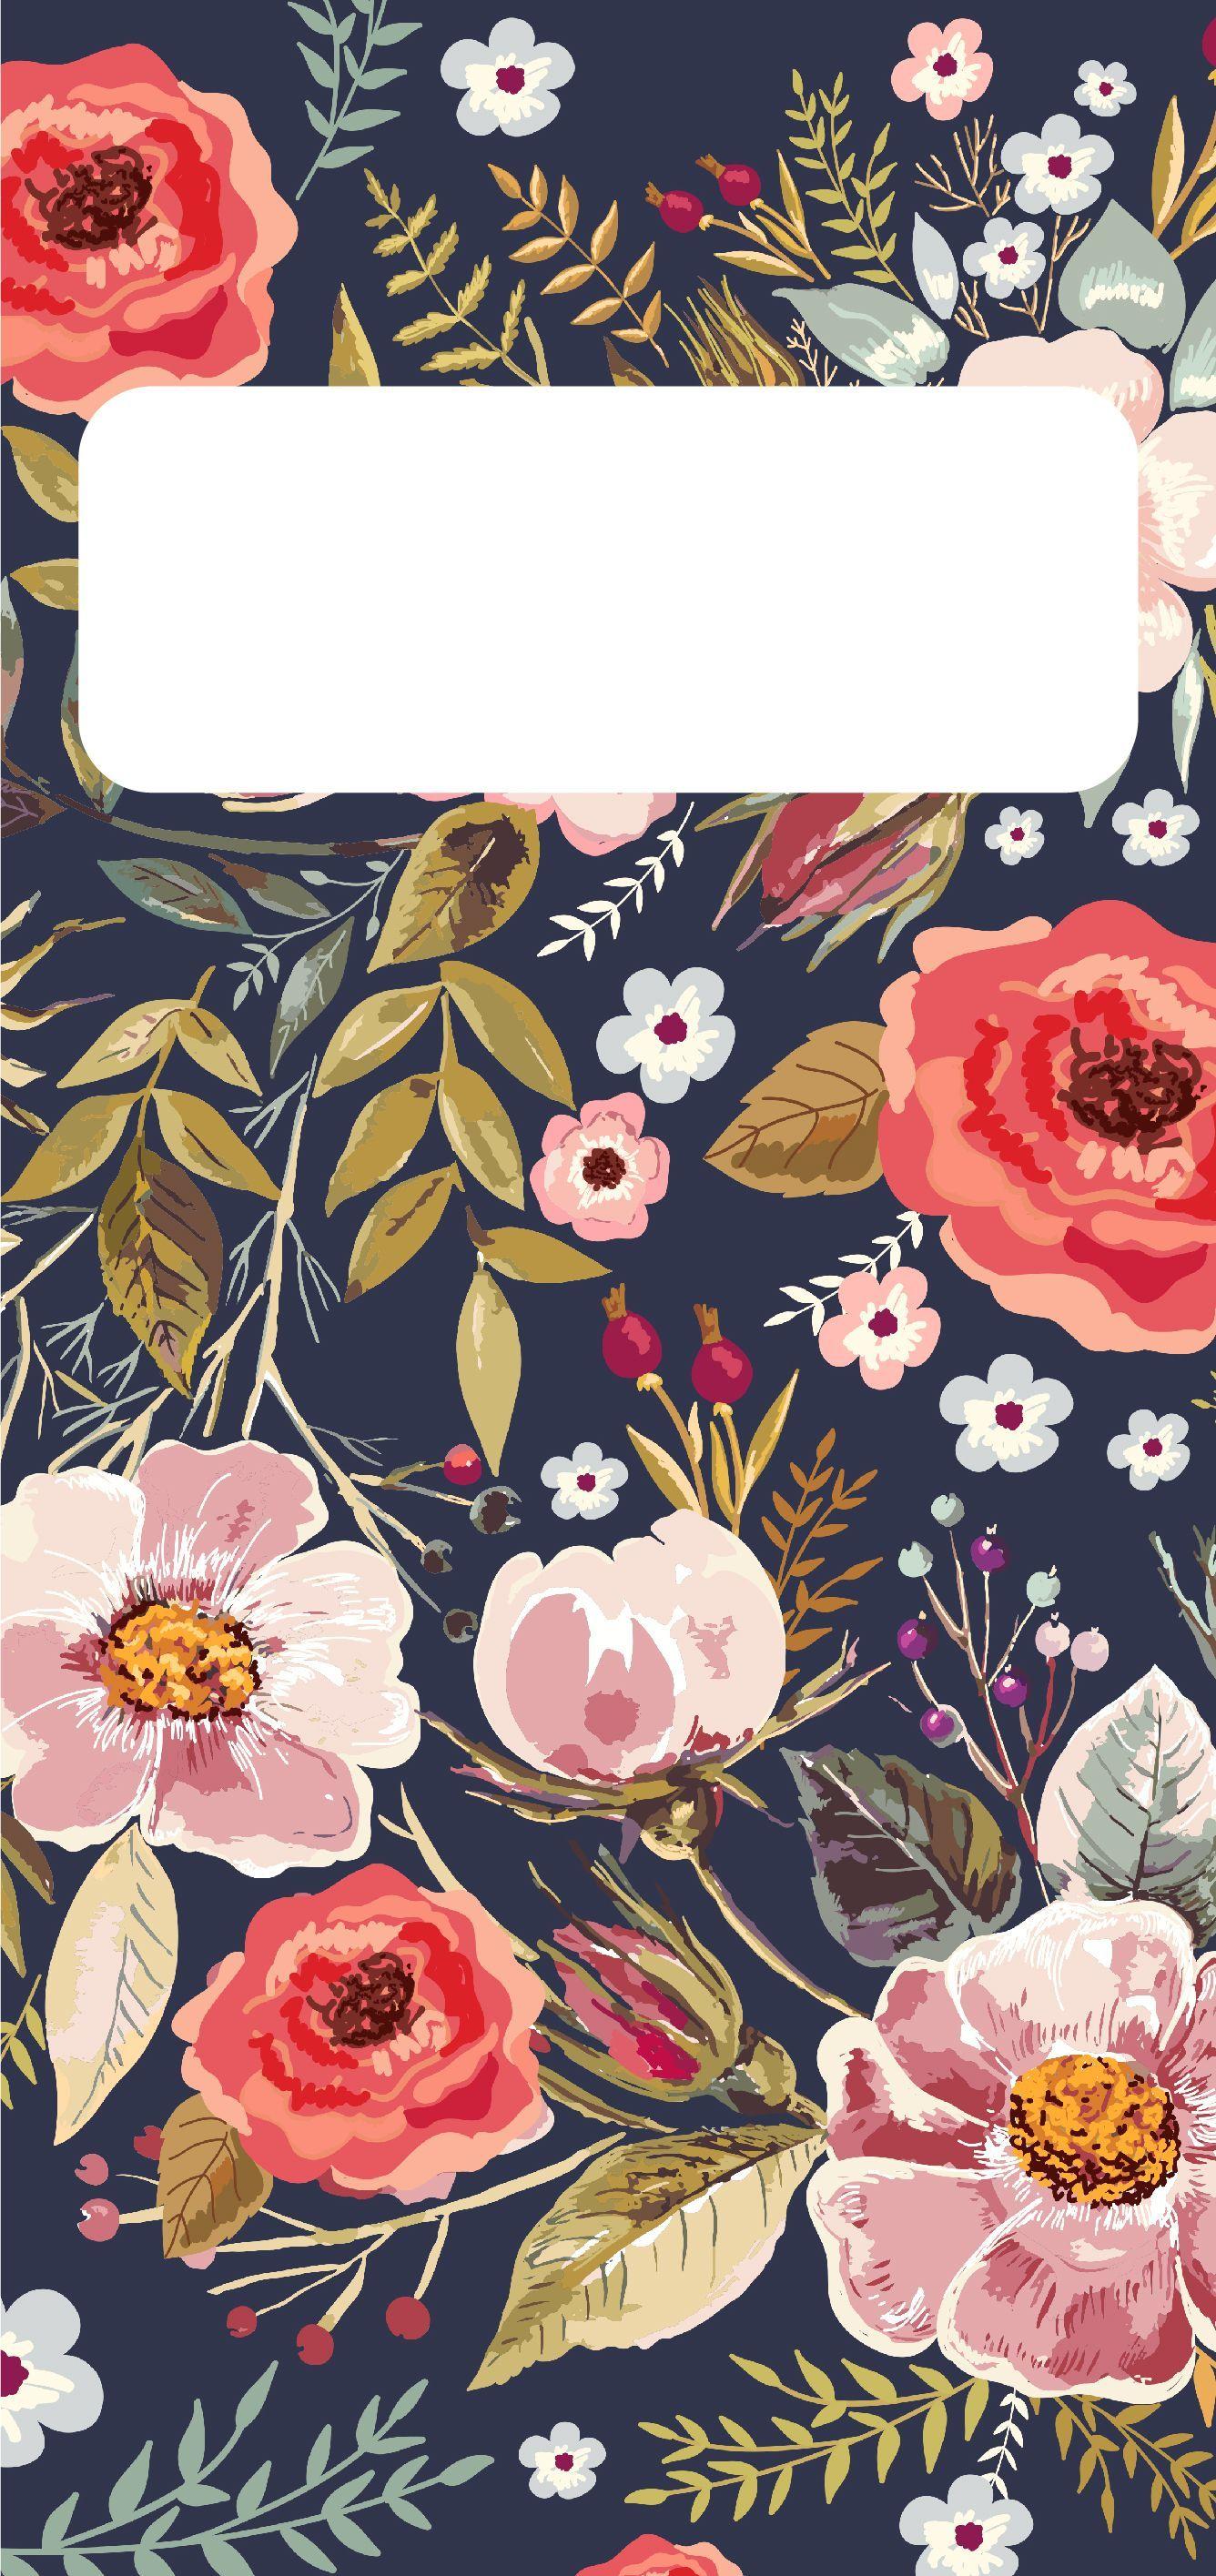 Fall Floral Wallpaper For Iphone Fallwallpaperiphone Cute Free